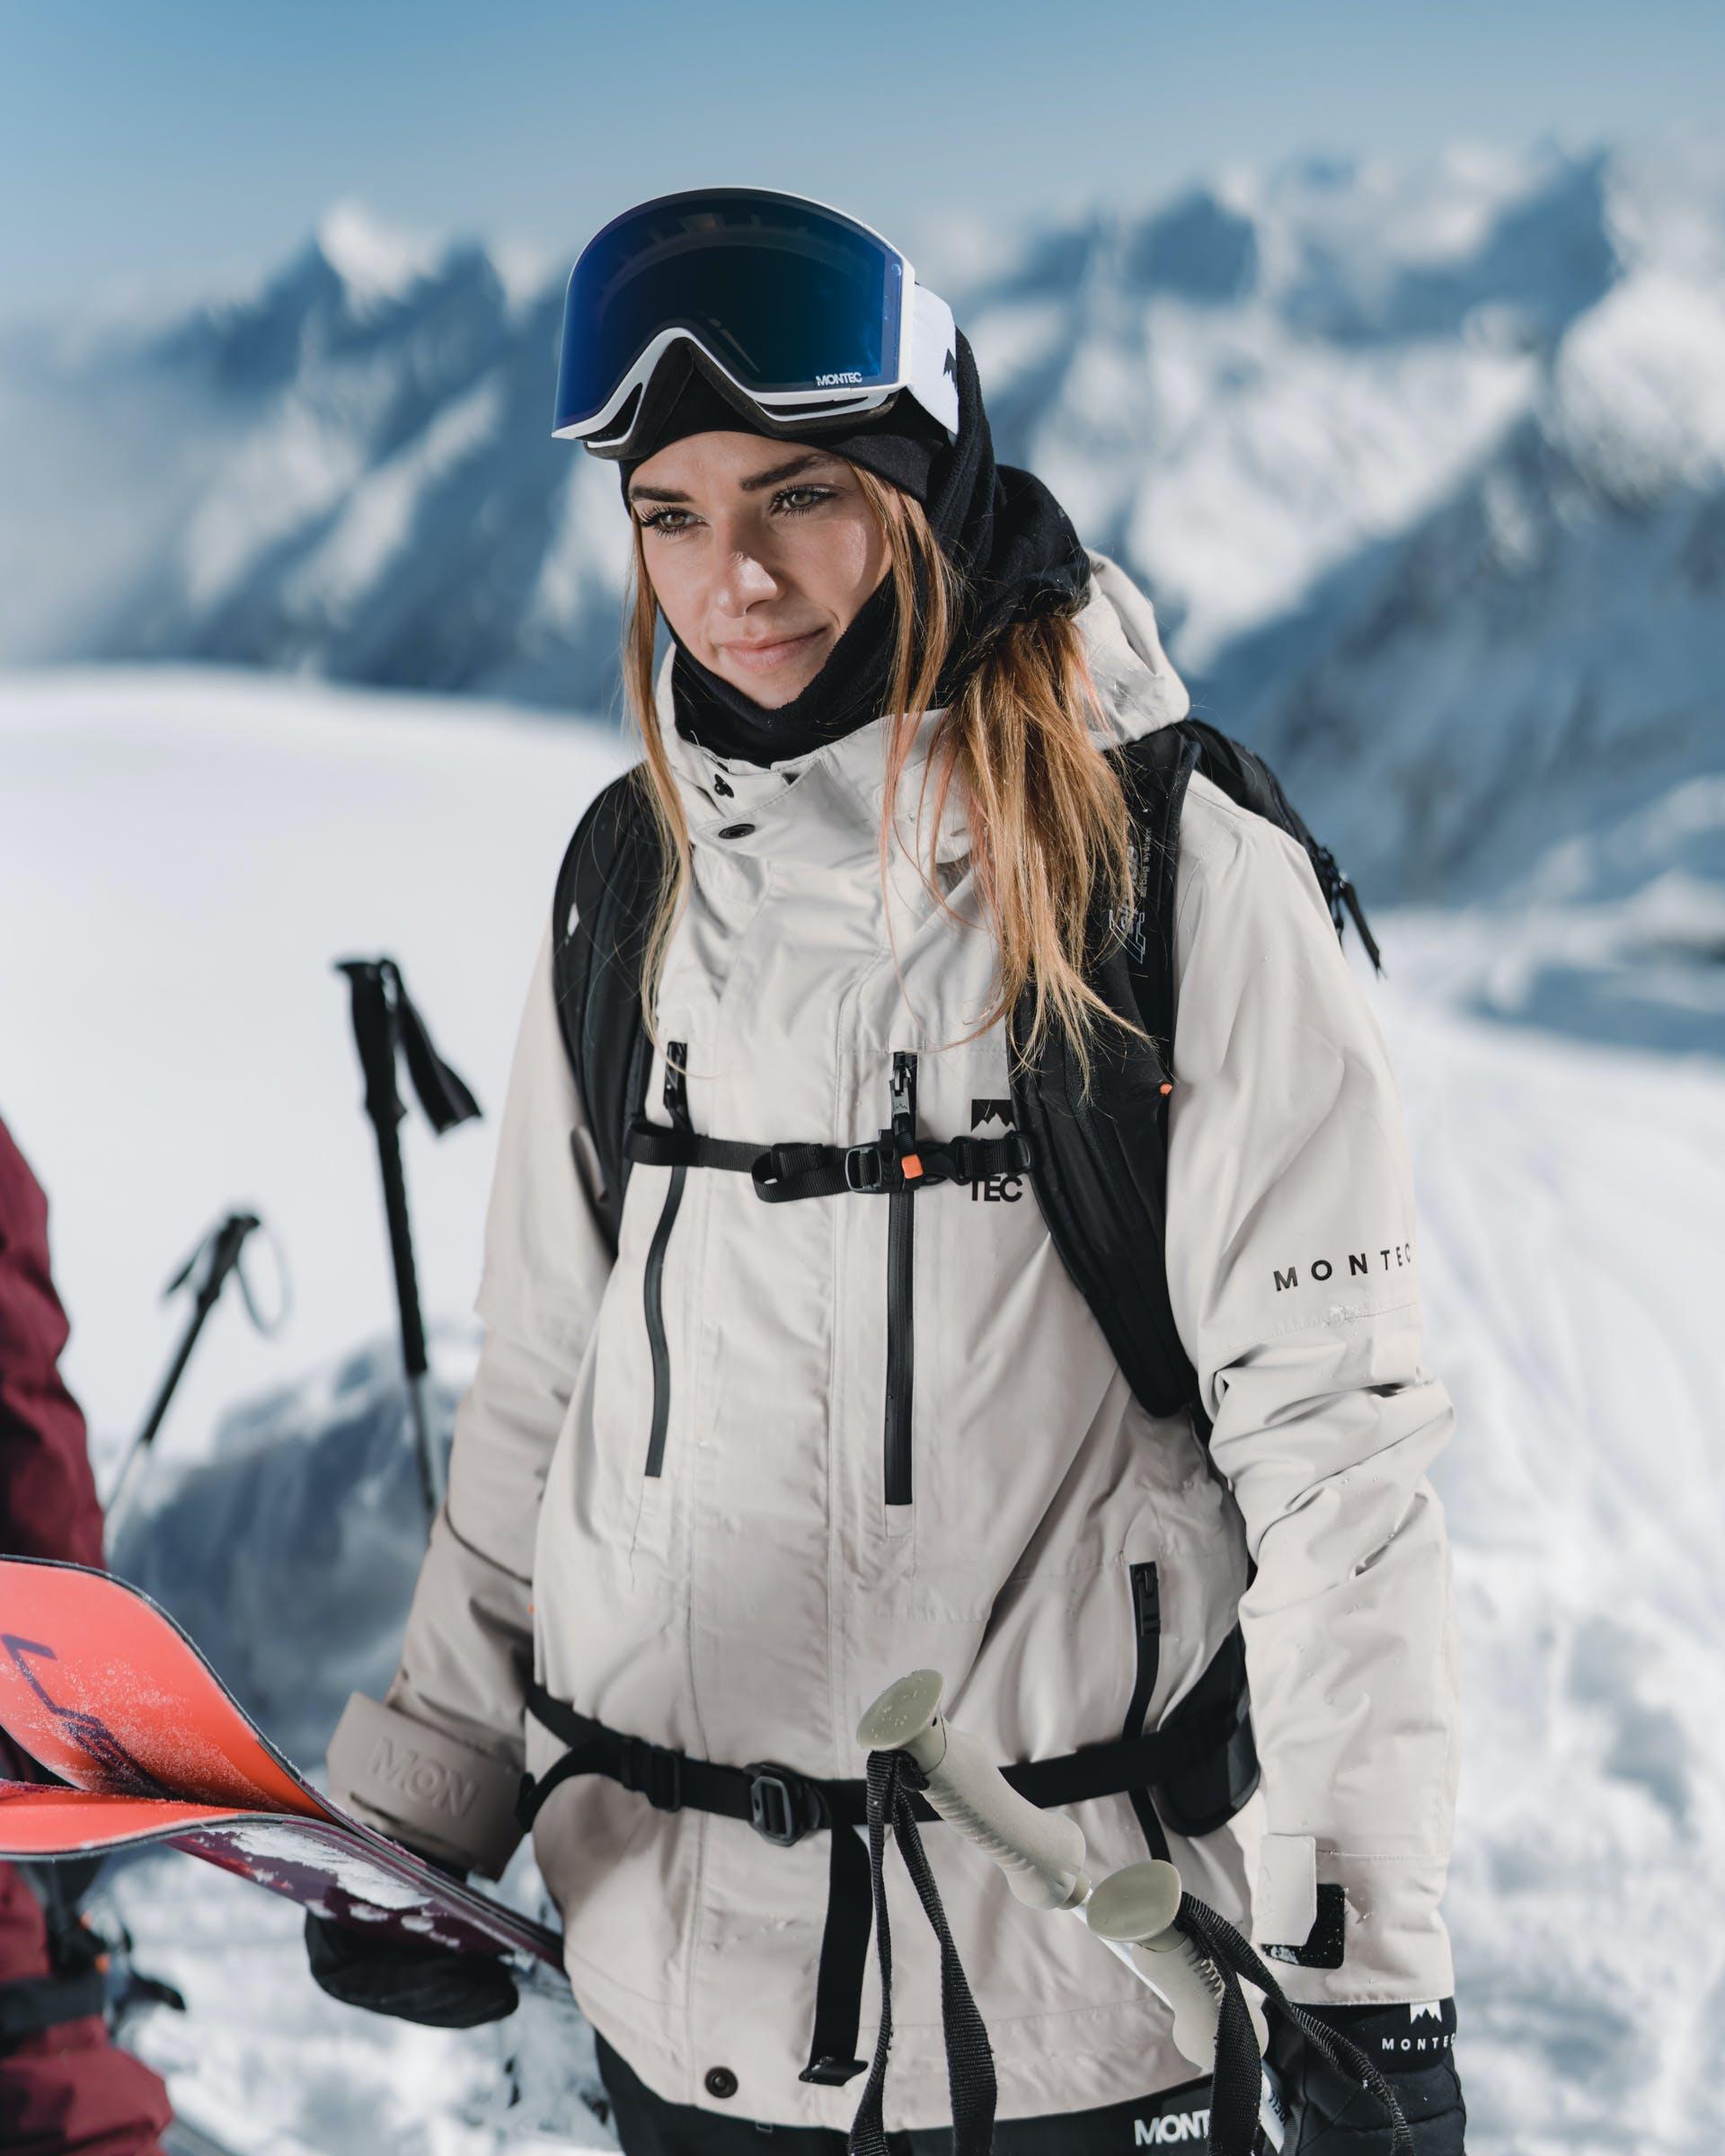 best women ski films